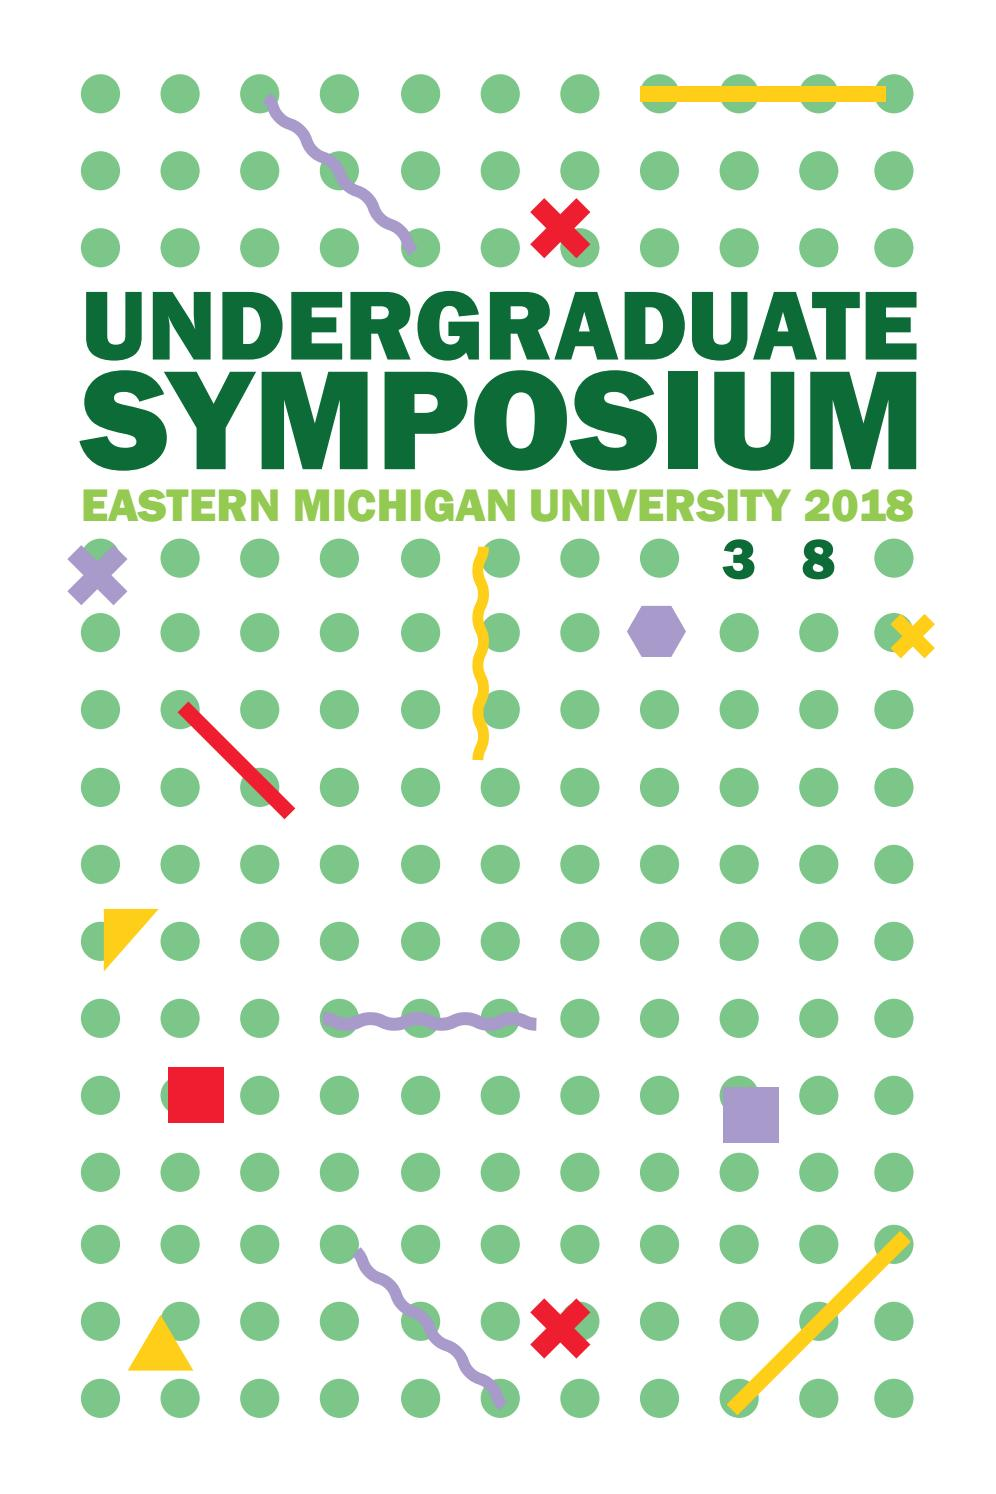 Eastern Michigan University 2018 Undergraduate Symposium by EMU